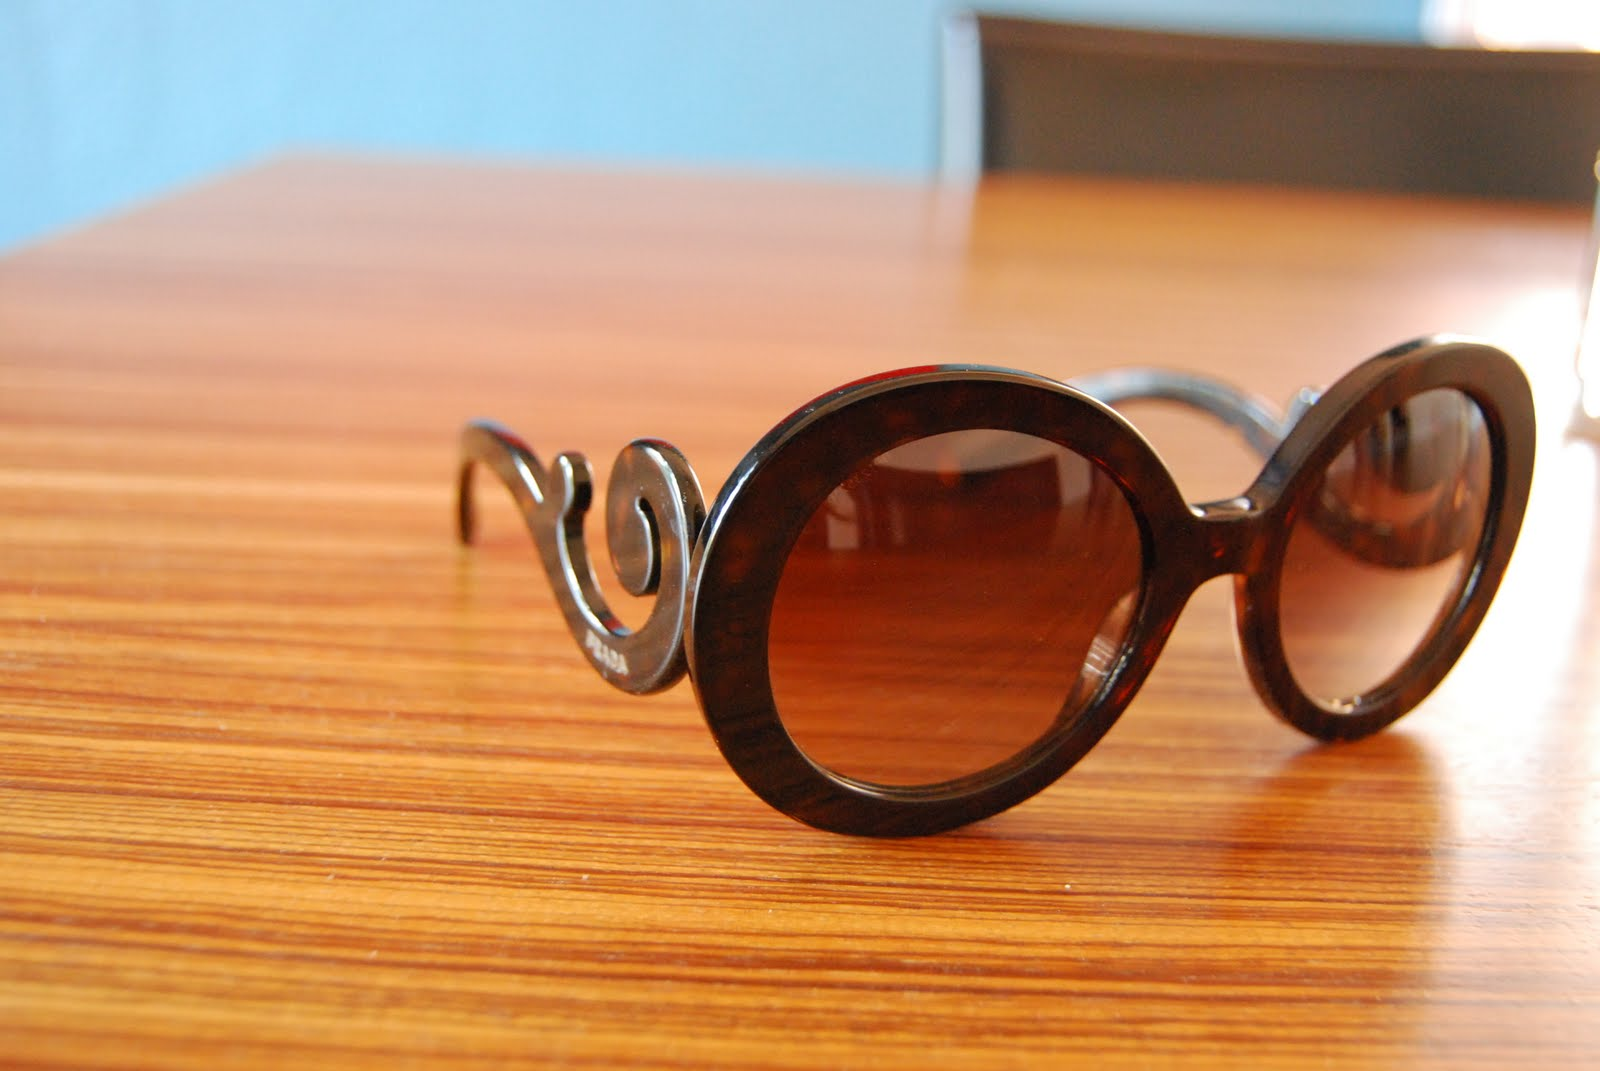 f3e6ae6d384 EAT Everyday  Prada Minimal Baroque Sunglasses  So Obsessed